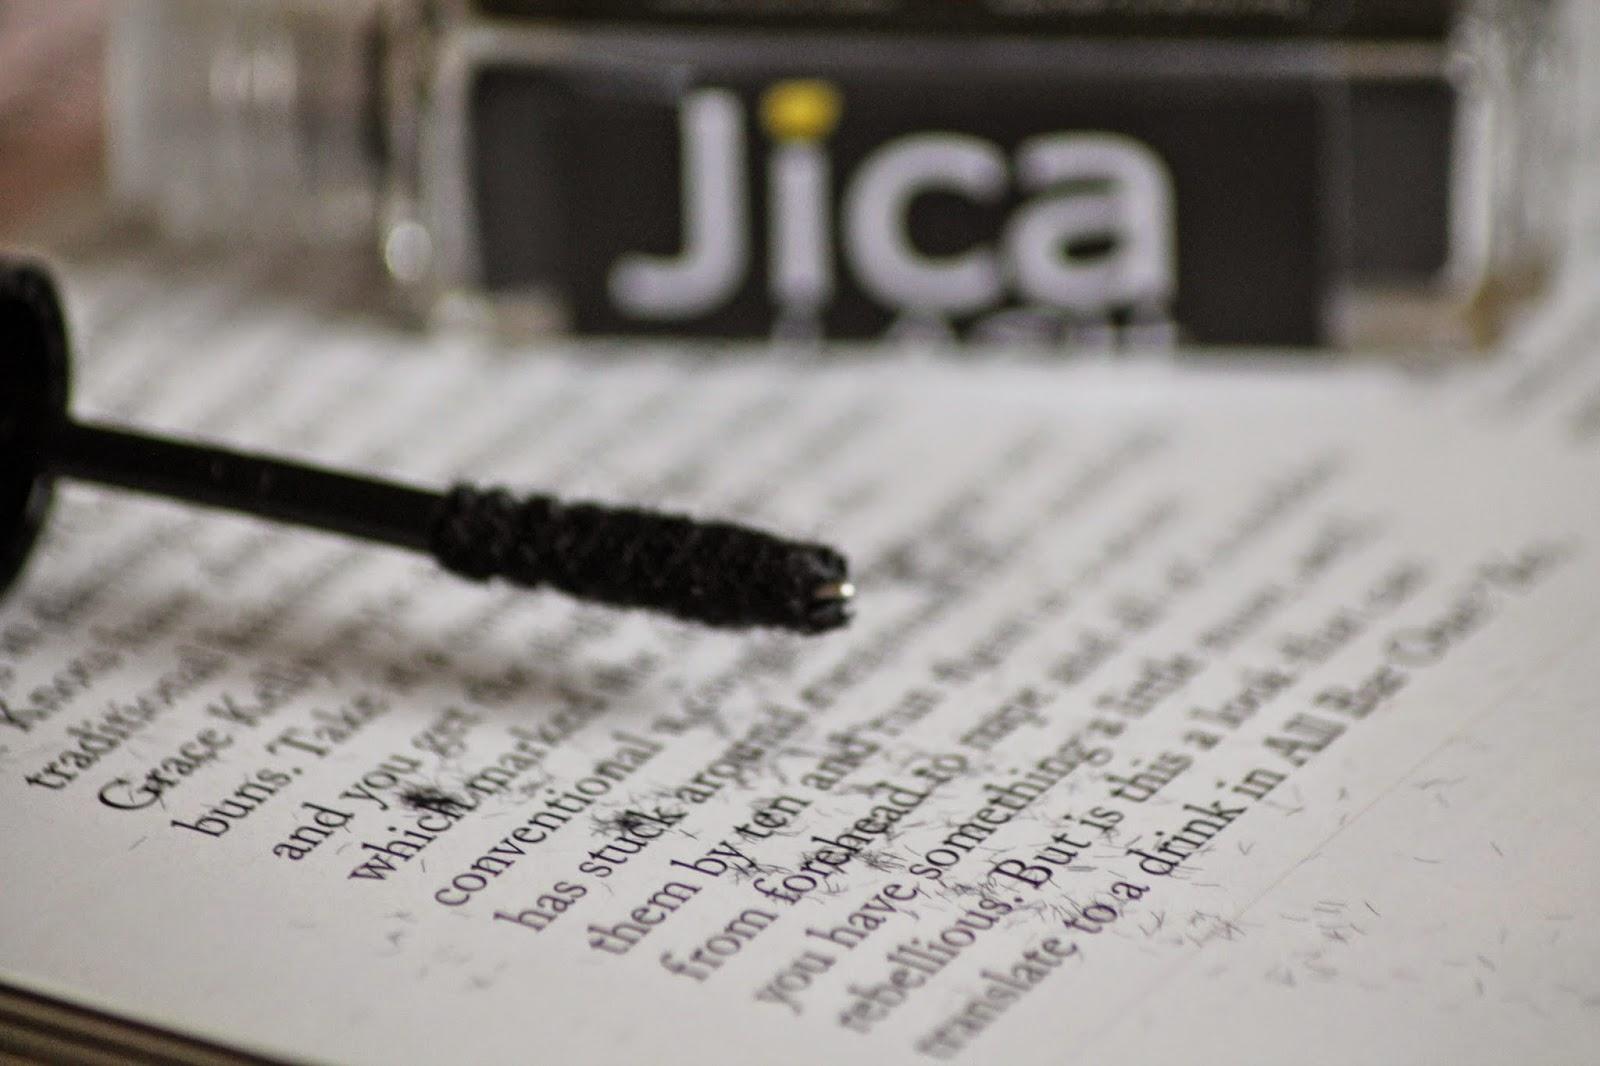 Jica Lash Extension Treatment - Aspiring Londoner